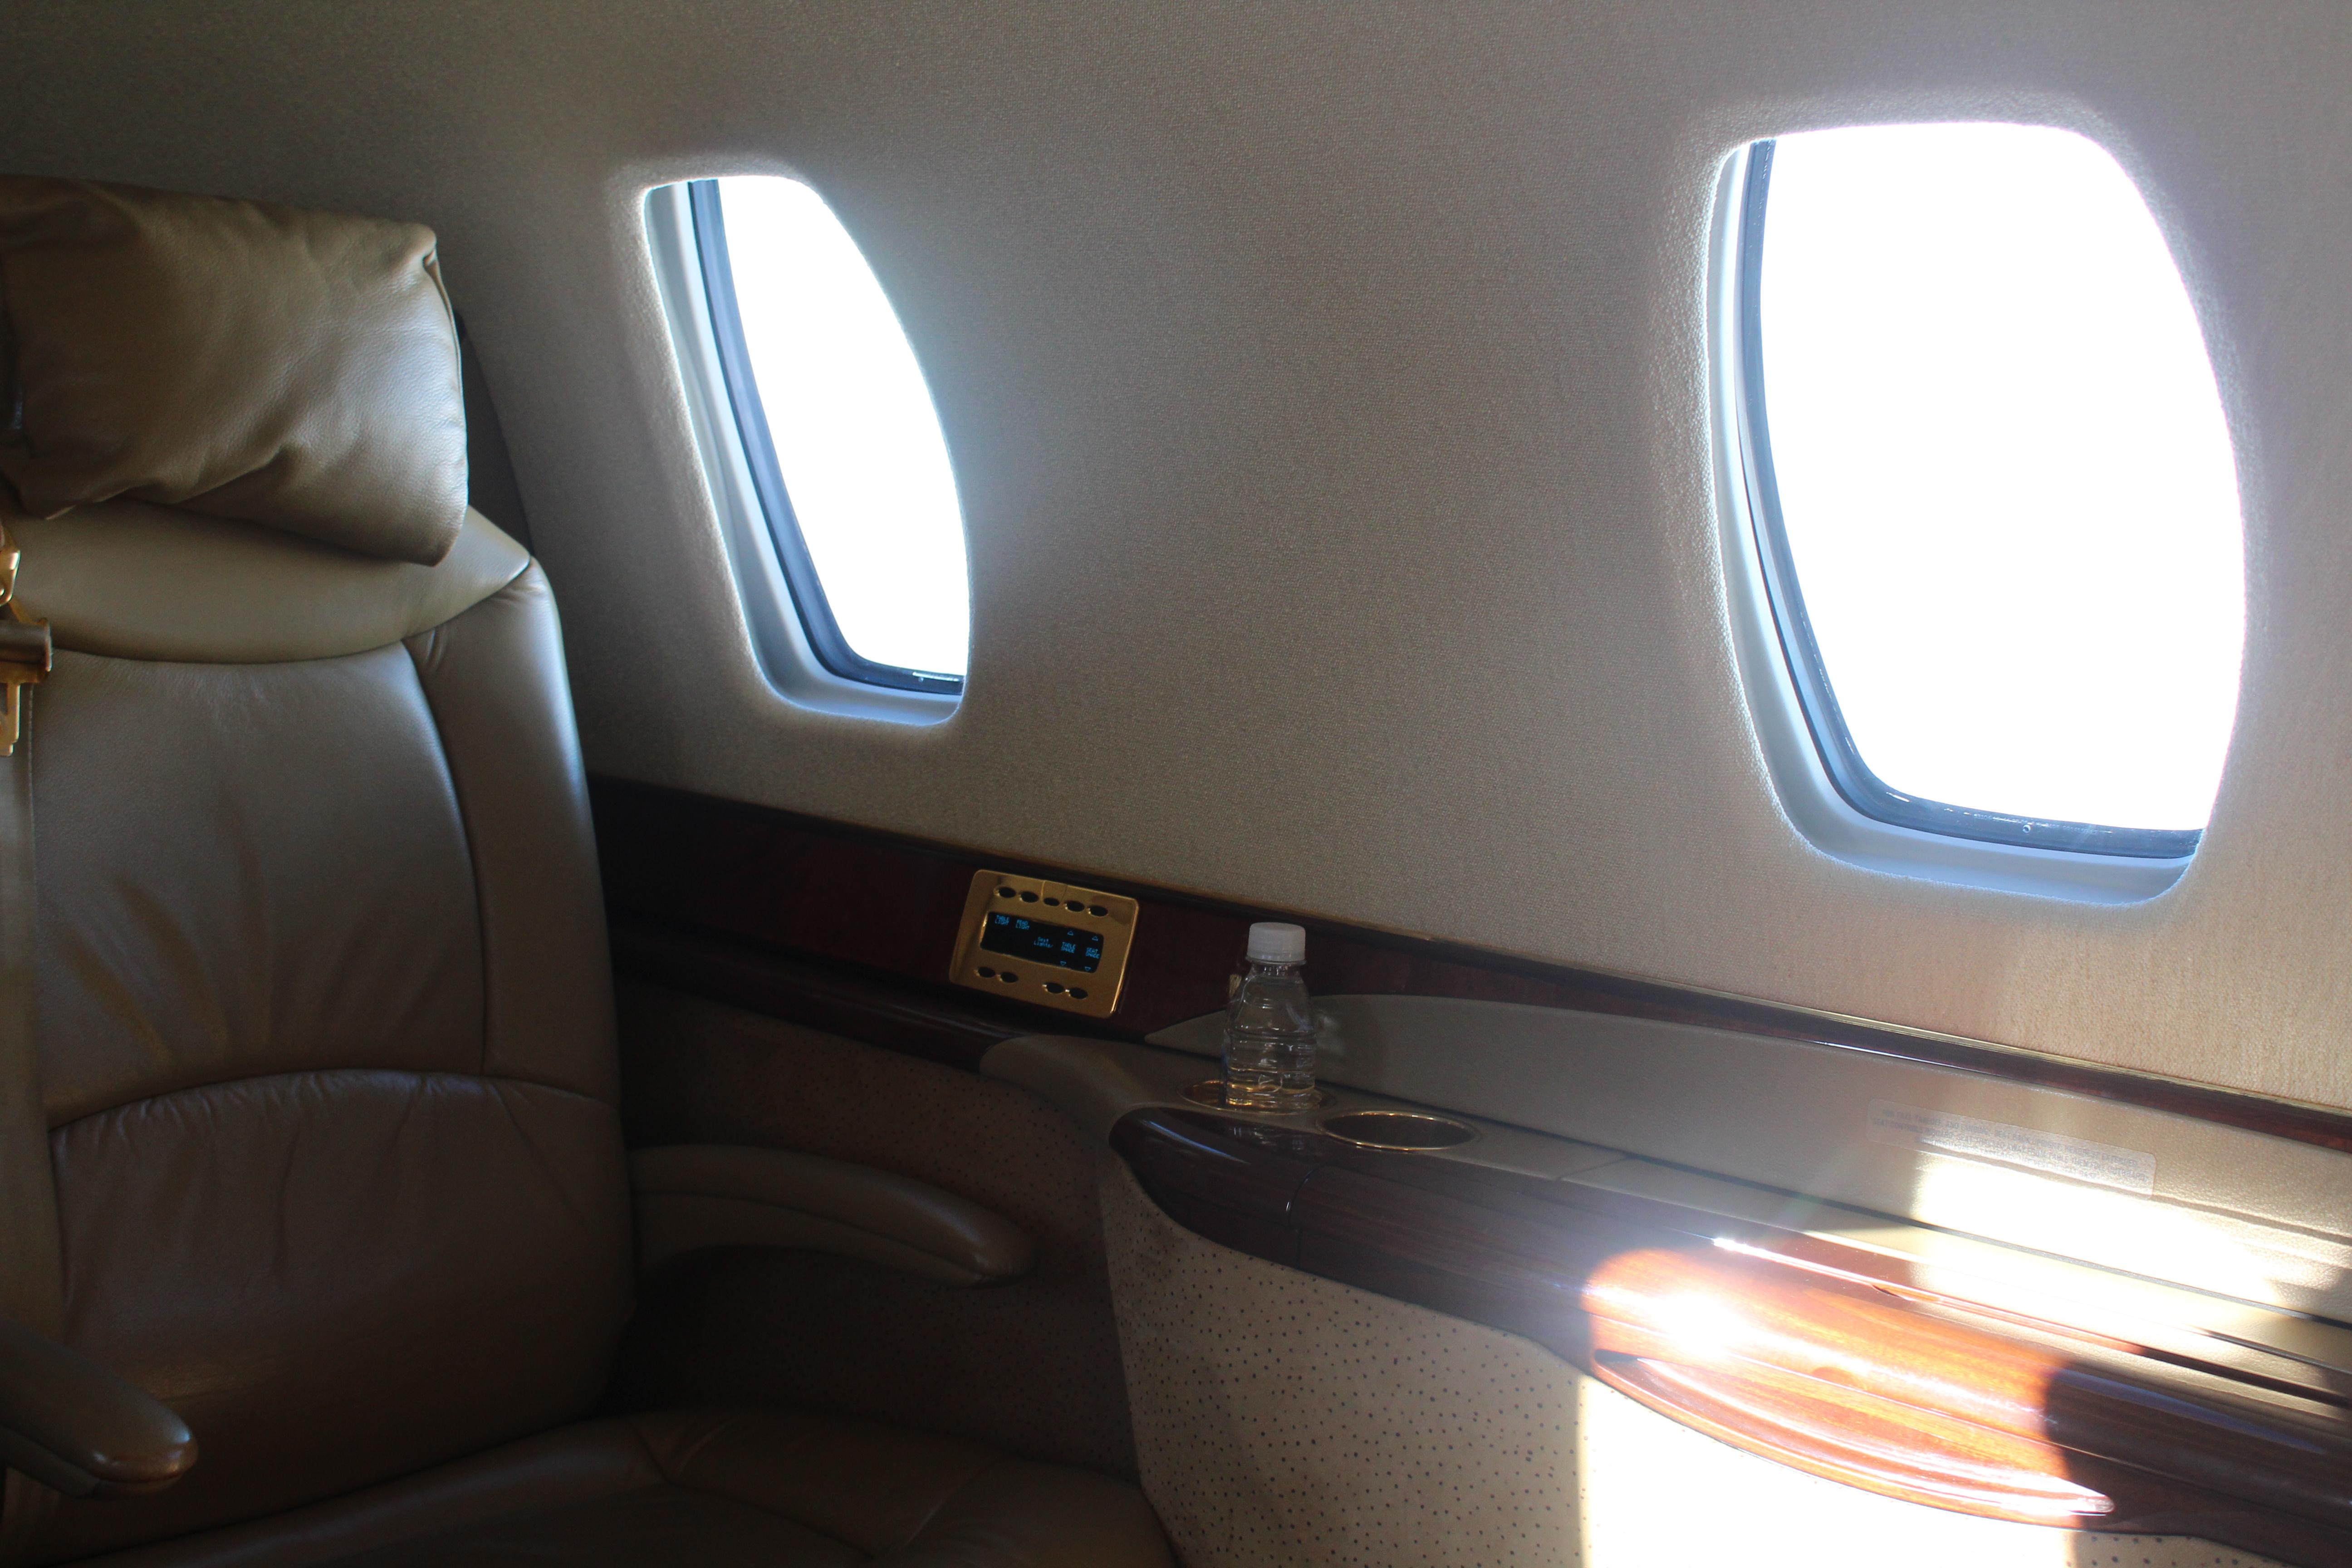 Oral fuck my flight attendant private jet